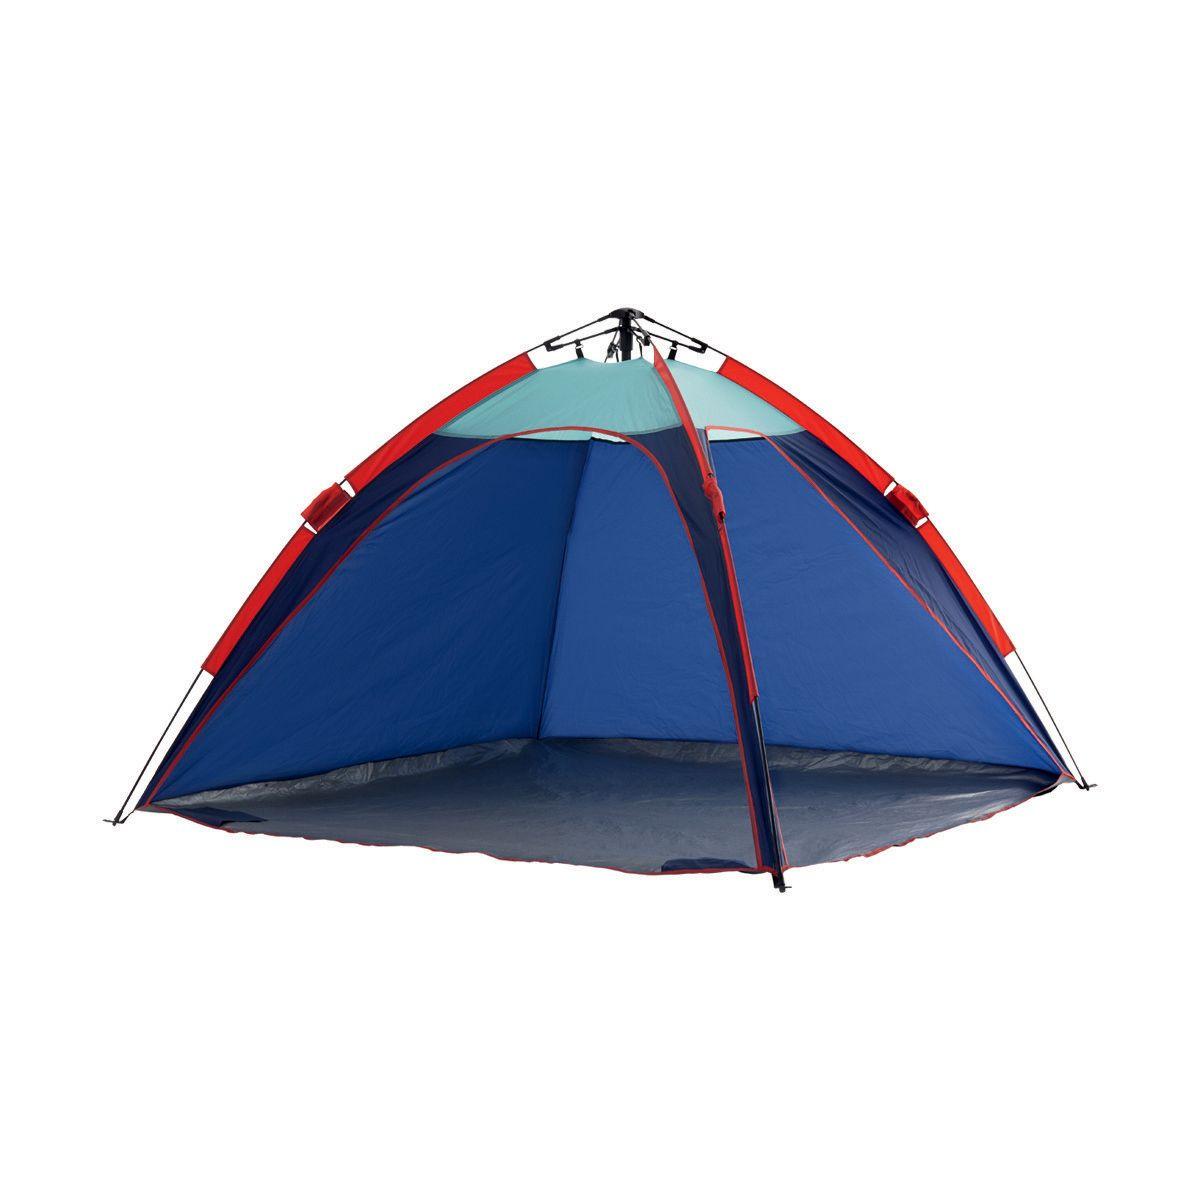 Instant Pop Up Sun Shelter | Kmart  sc 1 st  Pinterest & Instant Pop Up Sun Shelter | Kmart | Audreyu0027s wish list ...